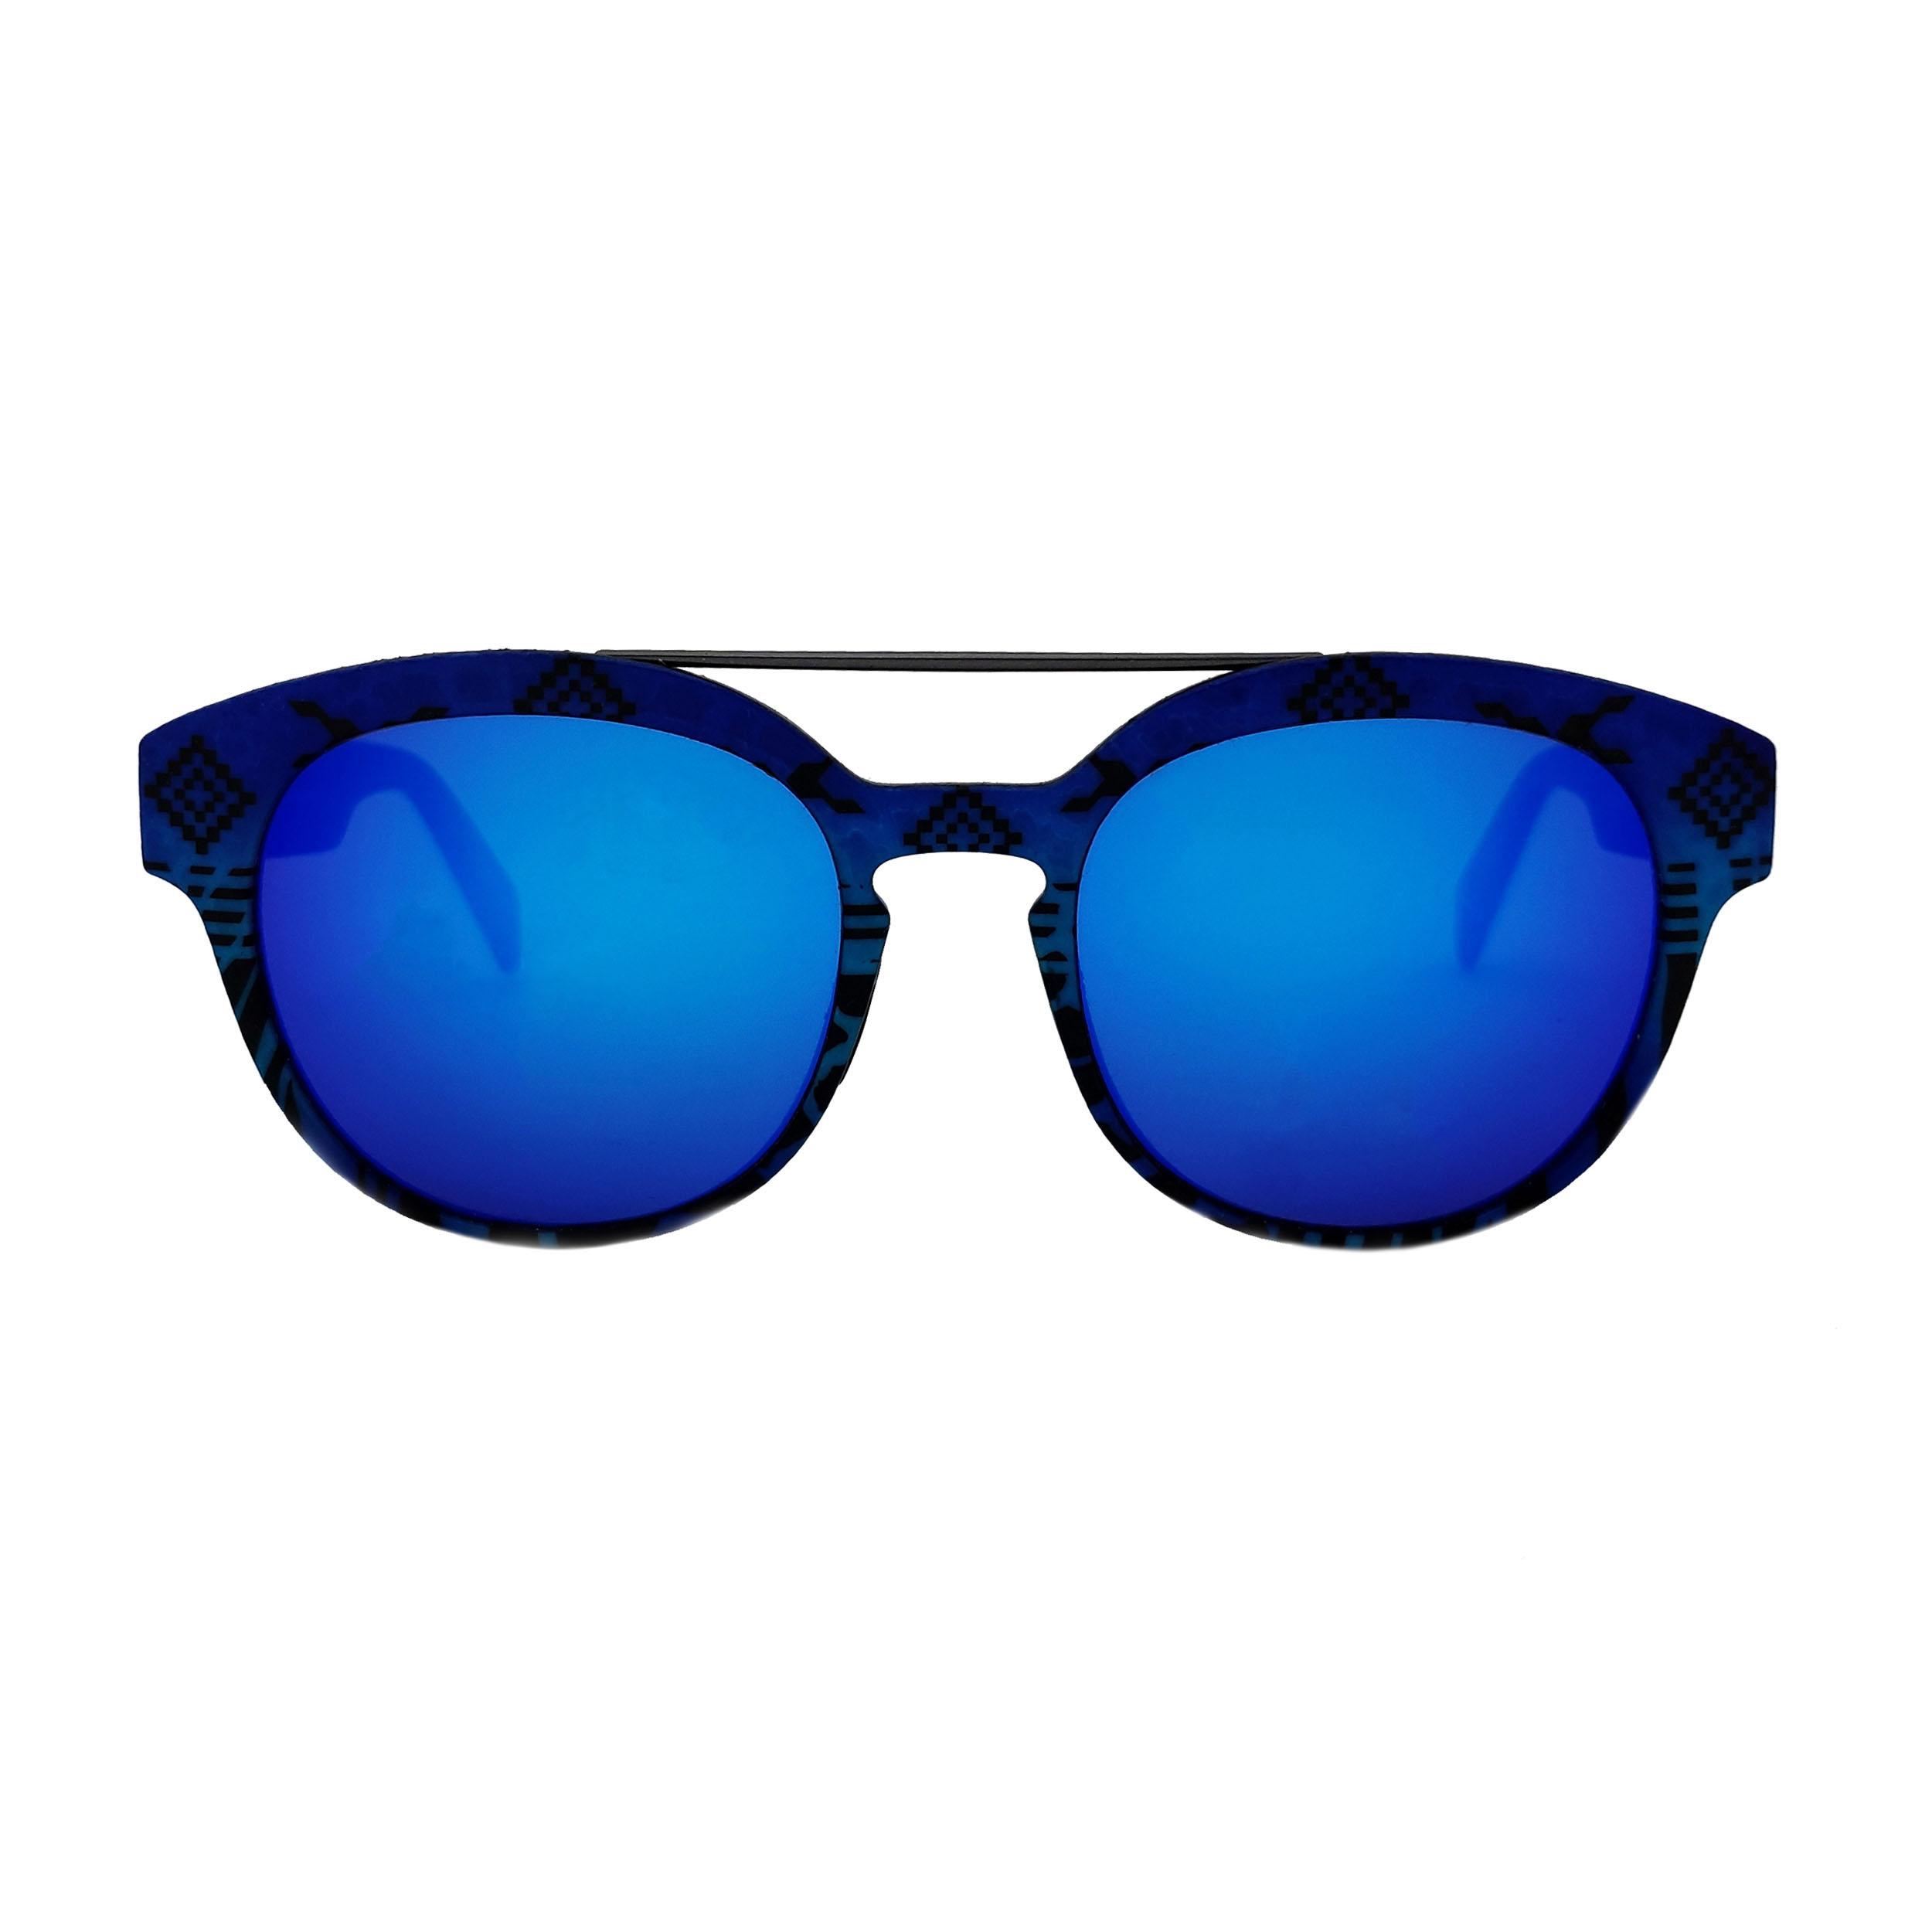 عینک آفتابی ایتالیا ایندپندنت کد 0900INX022000